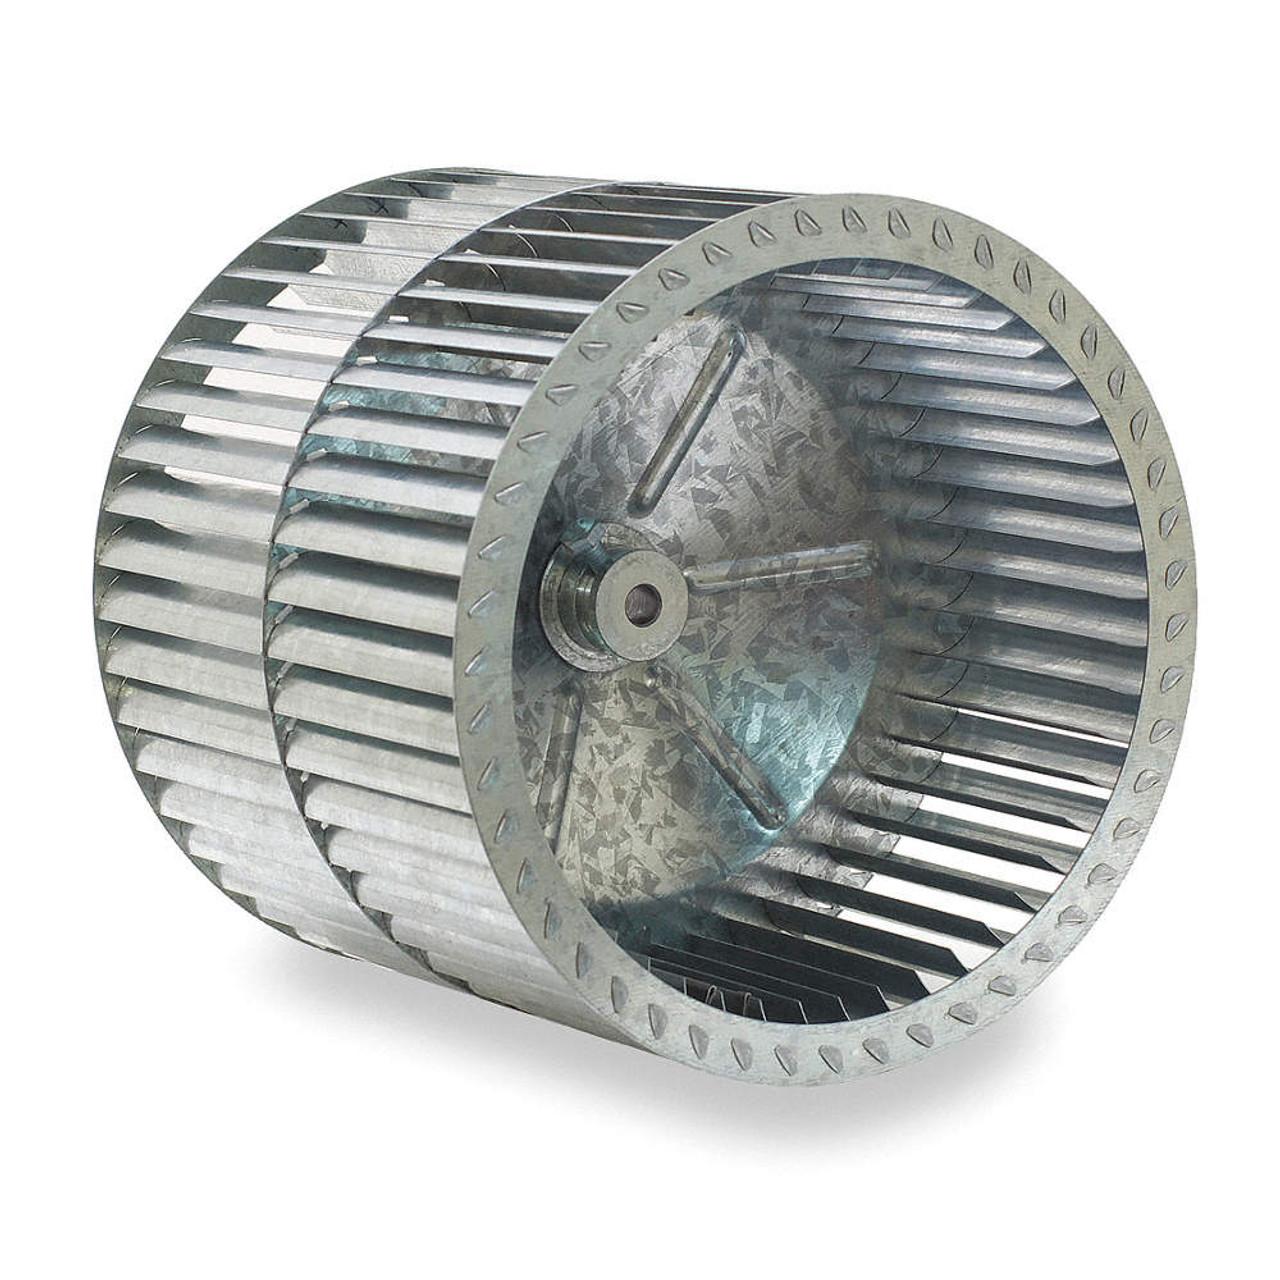 008364-12 Blower Wheel 10-5/8 Inch Diameter